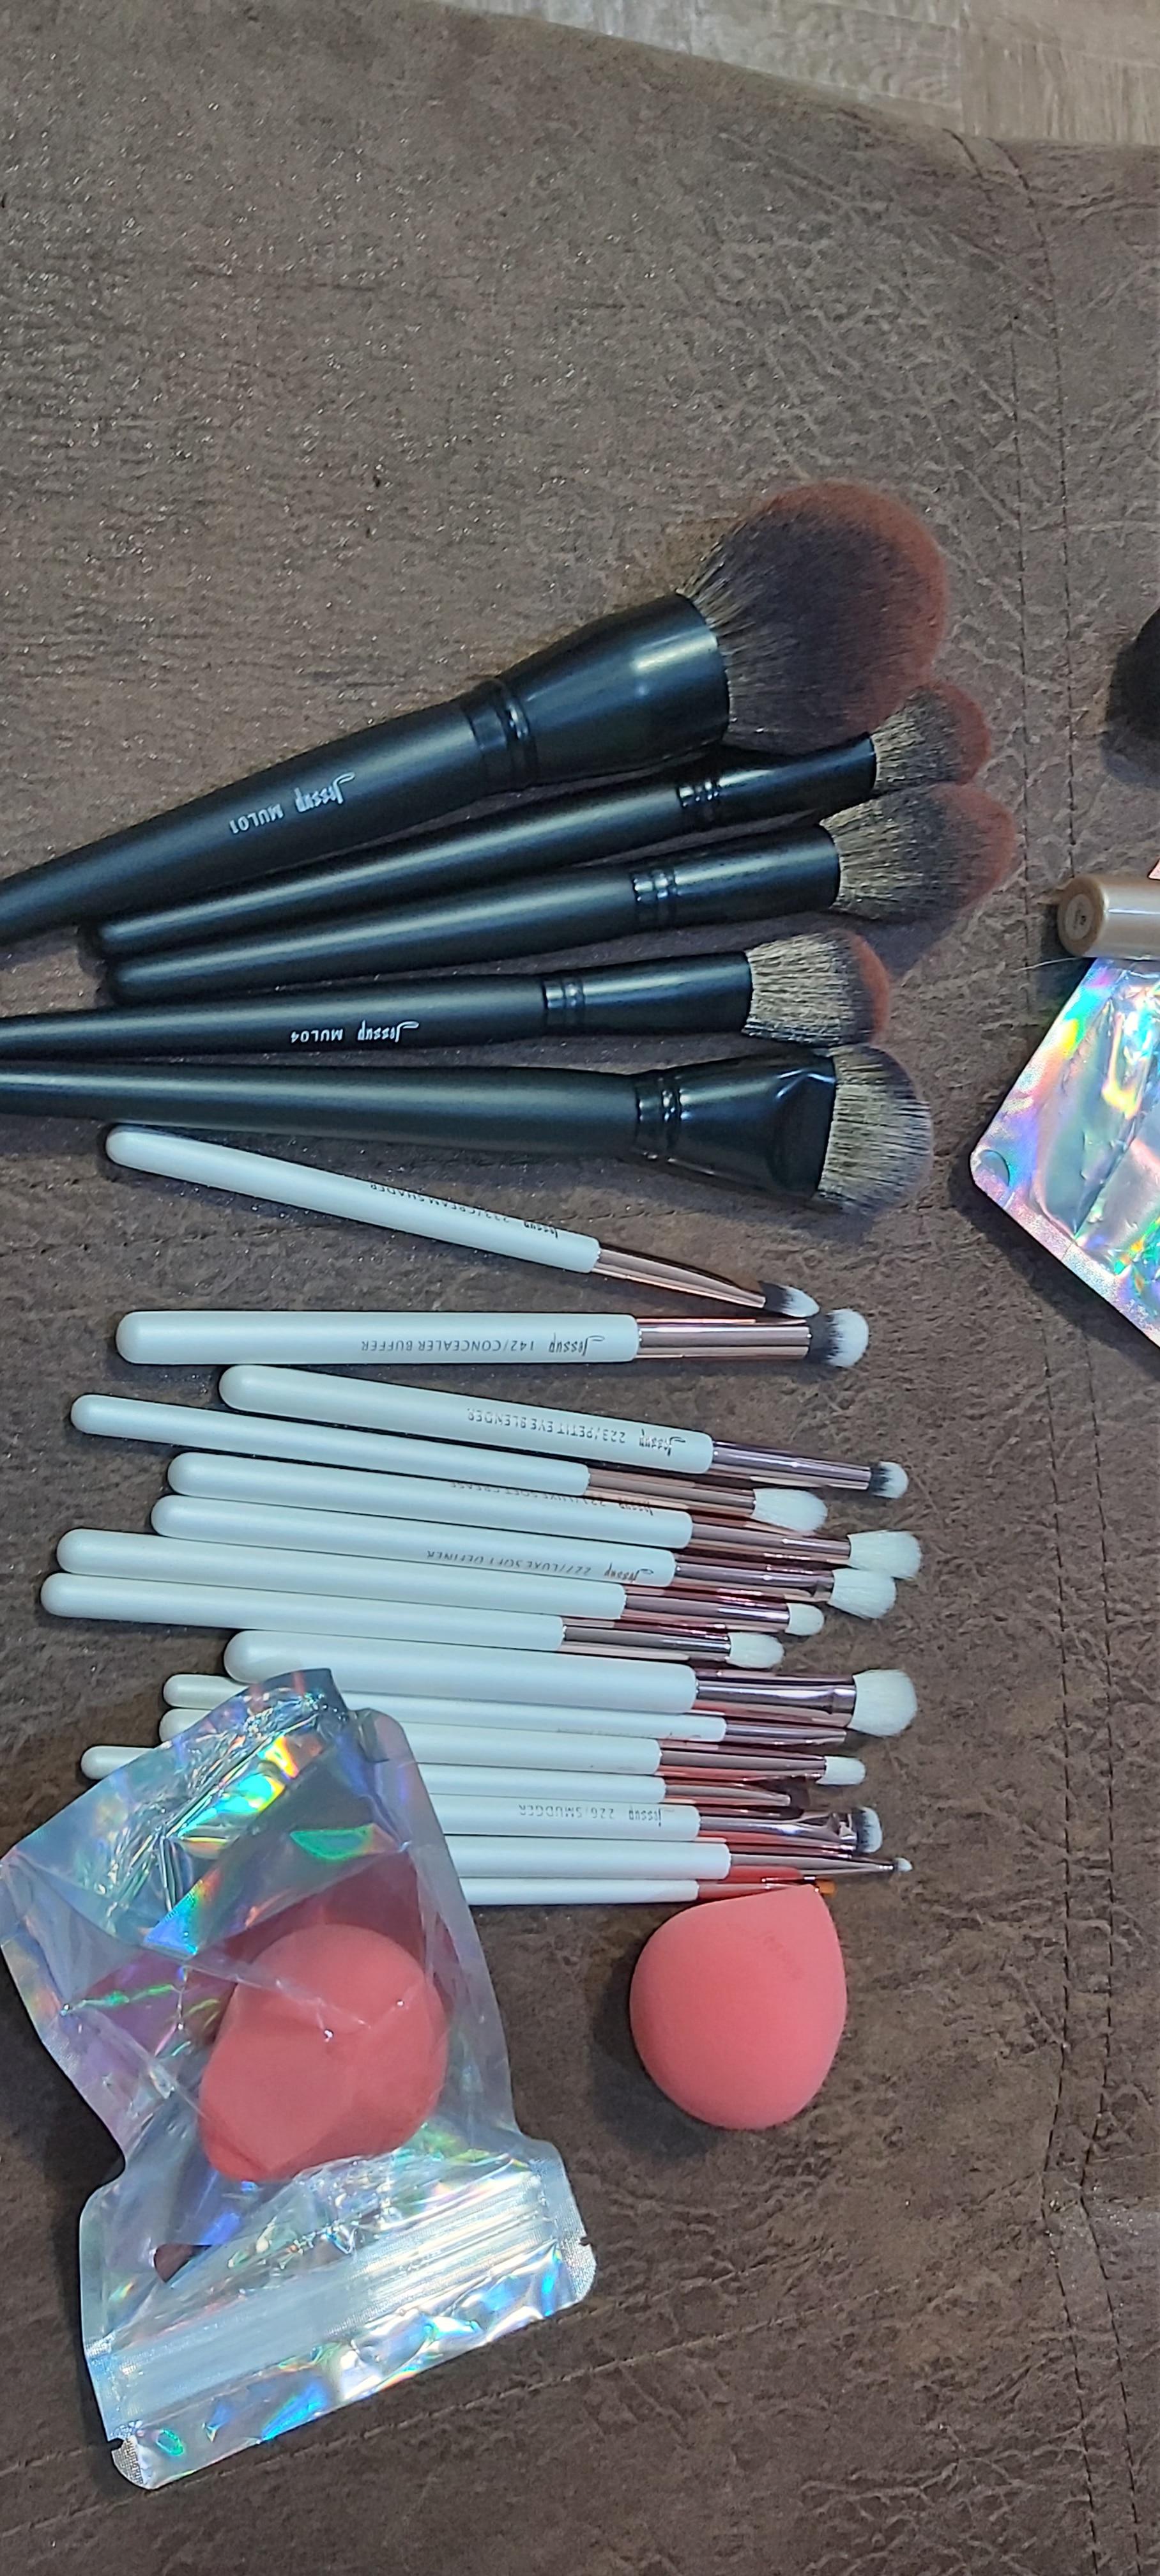 Jessup New Arrival Makeup brushes brushes Phantom Black 3-21pcs Foundation brush Powder Concealer Eyeshadow Synthetic hair reviews №1 177766